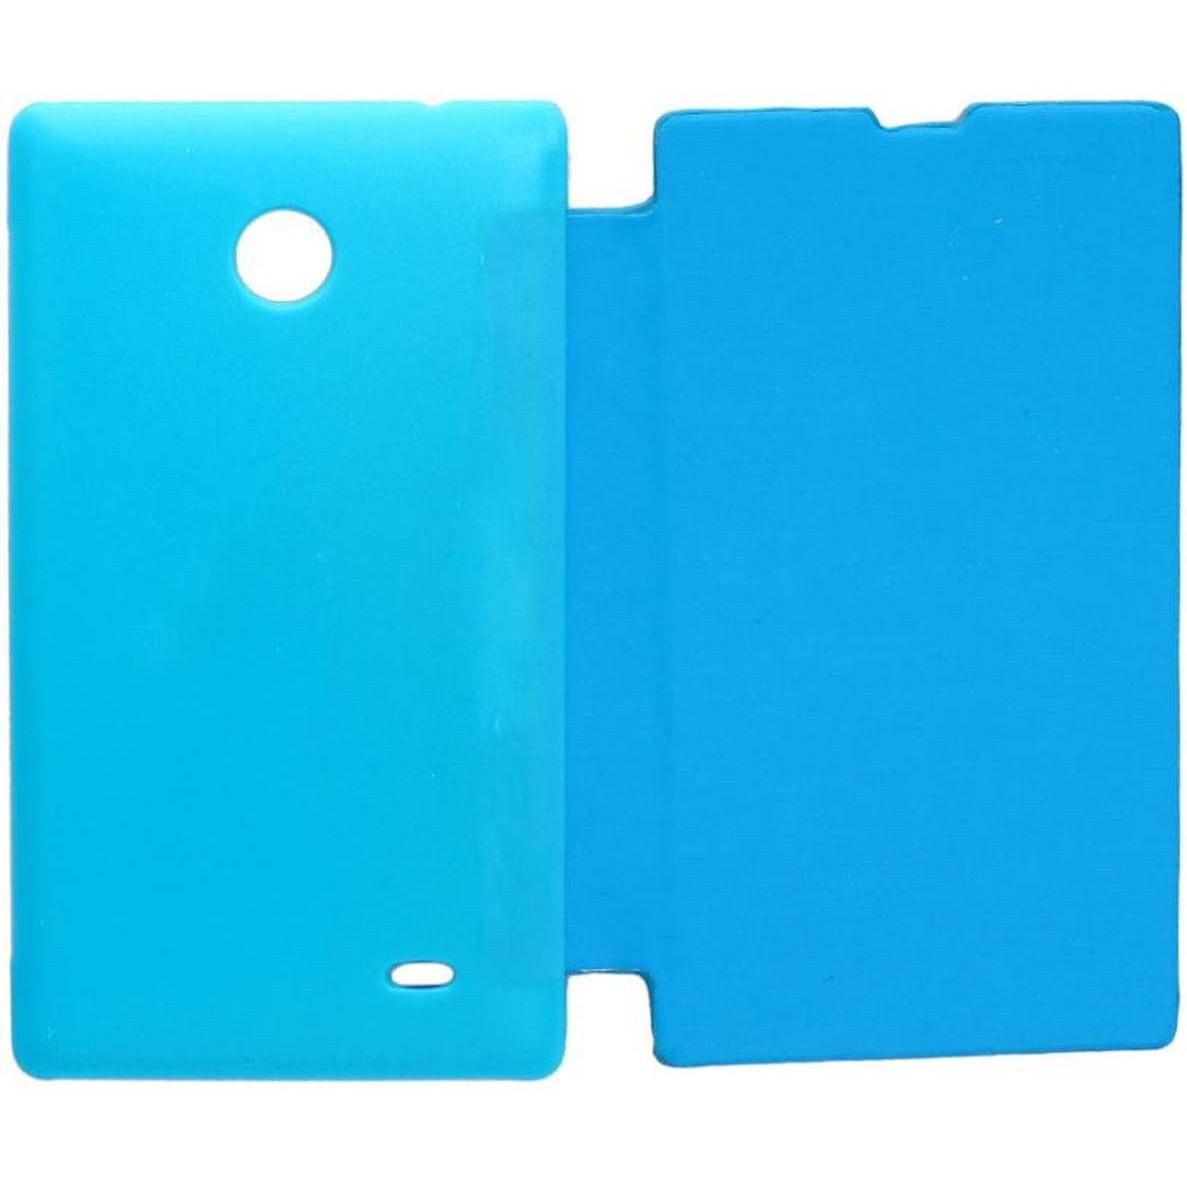 official photos 9c251 19036 Flip Cover for Nokia X plus Dual SIM - Cyan